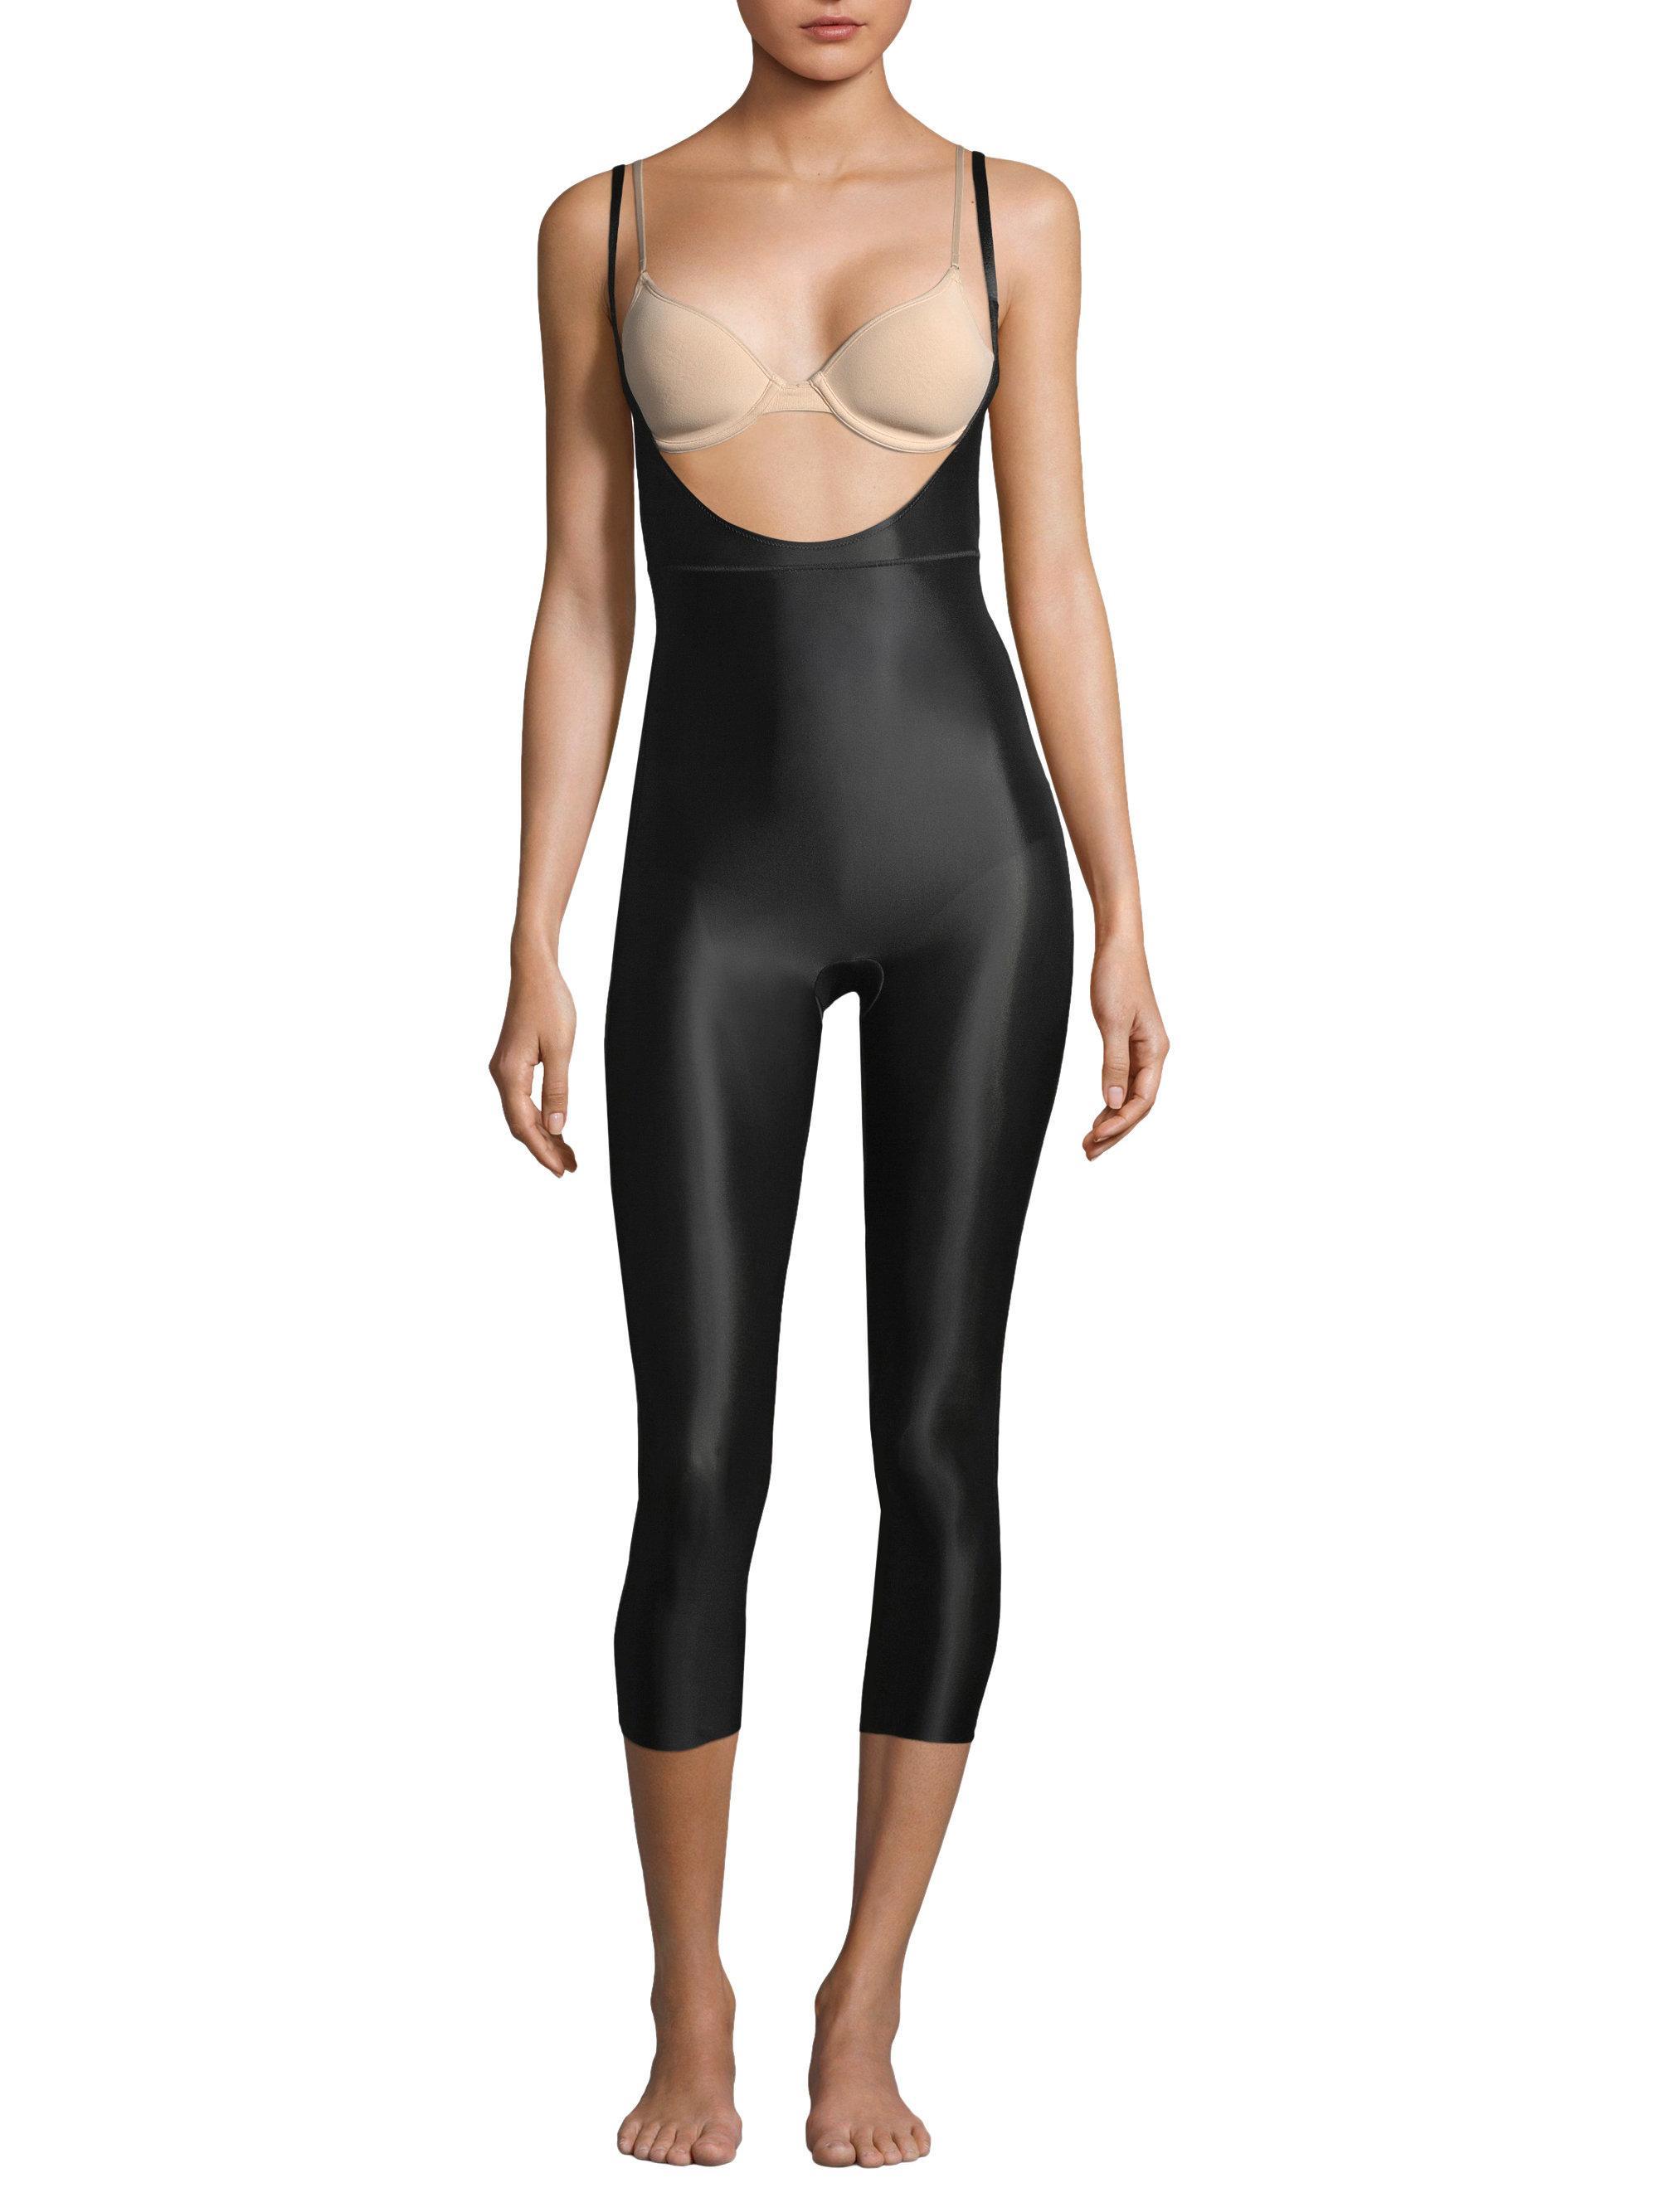 68aa3c9e38d Spanx Women s Suit Your Fancy Open-bust Bodysuit - Very Black - Size ...